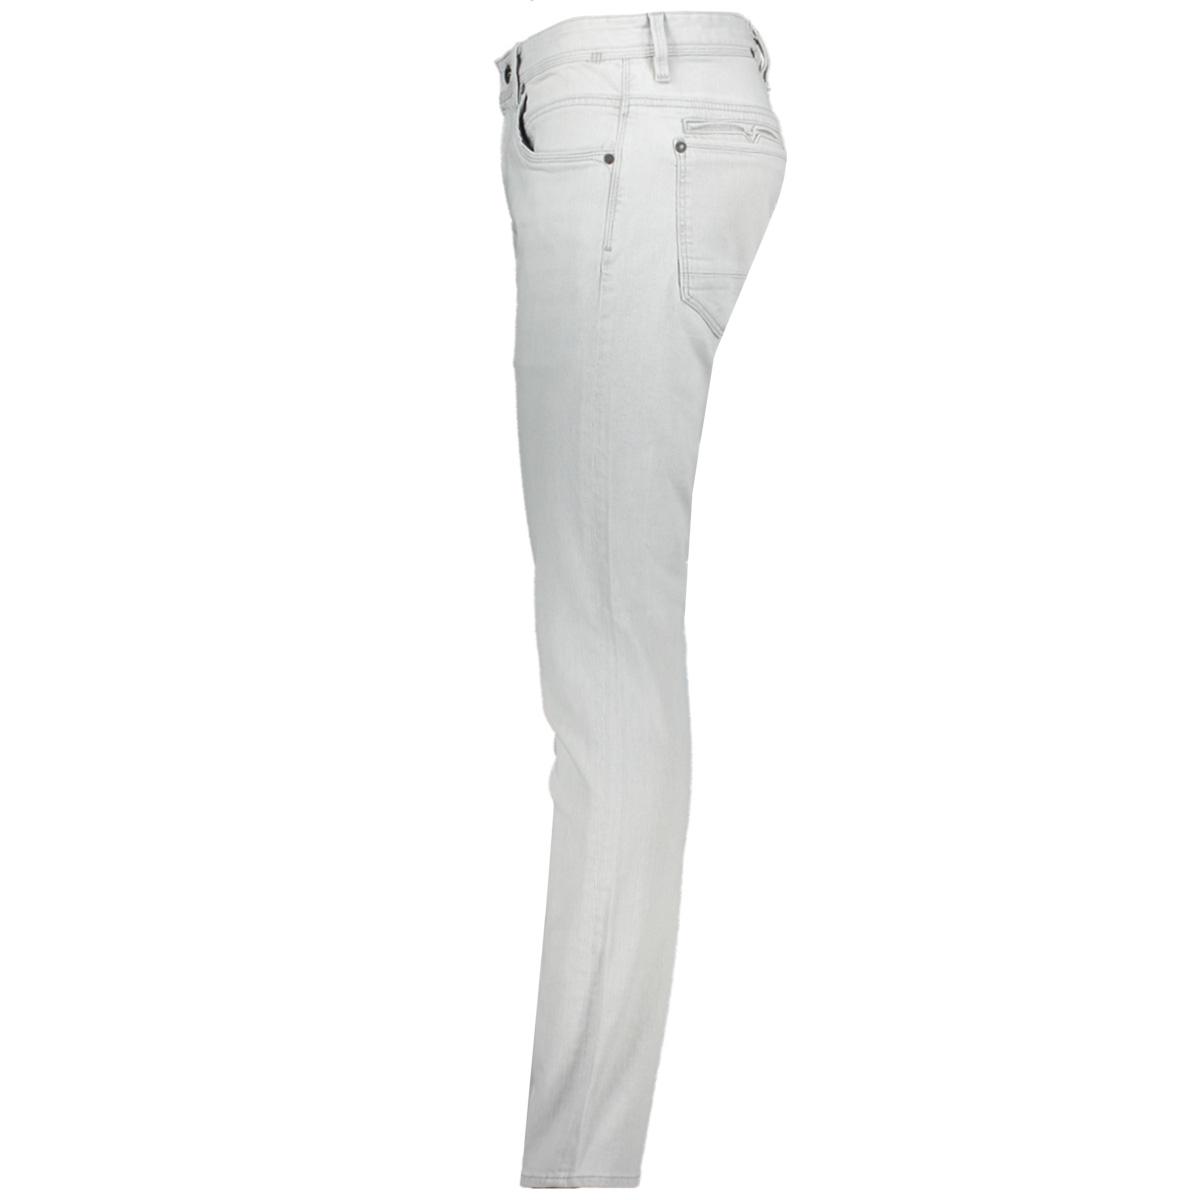 v850 rider colored denim vtr201101 vanguard jeans 9090